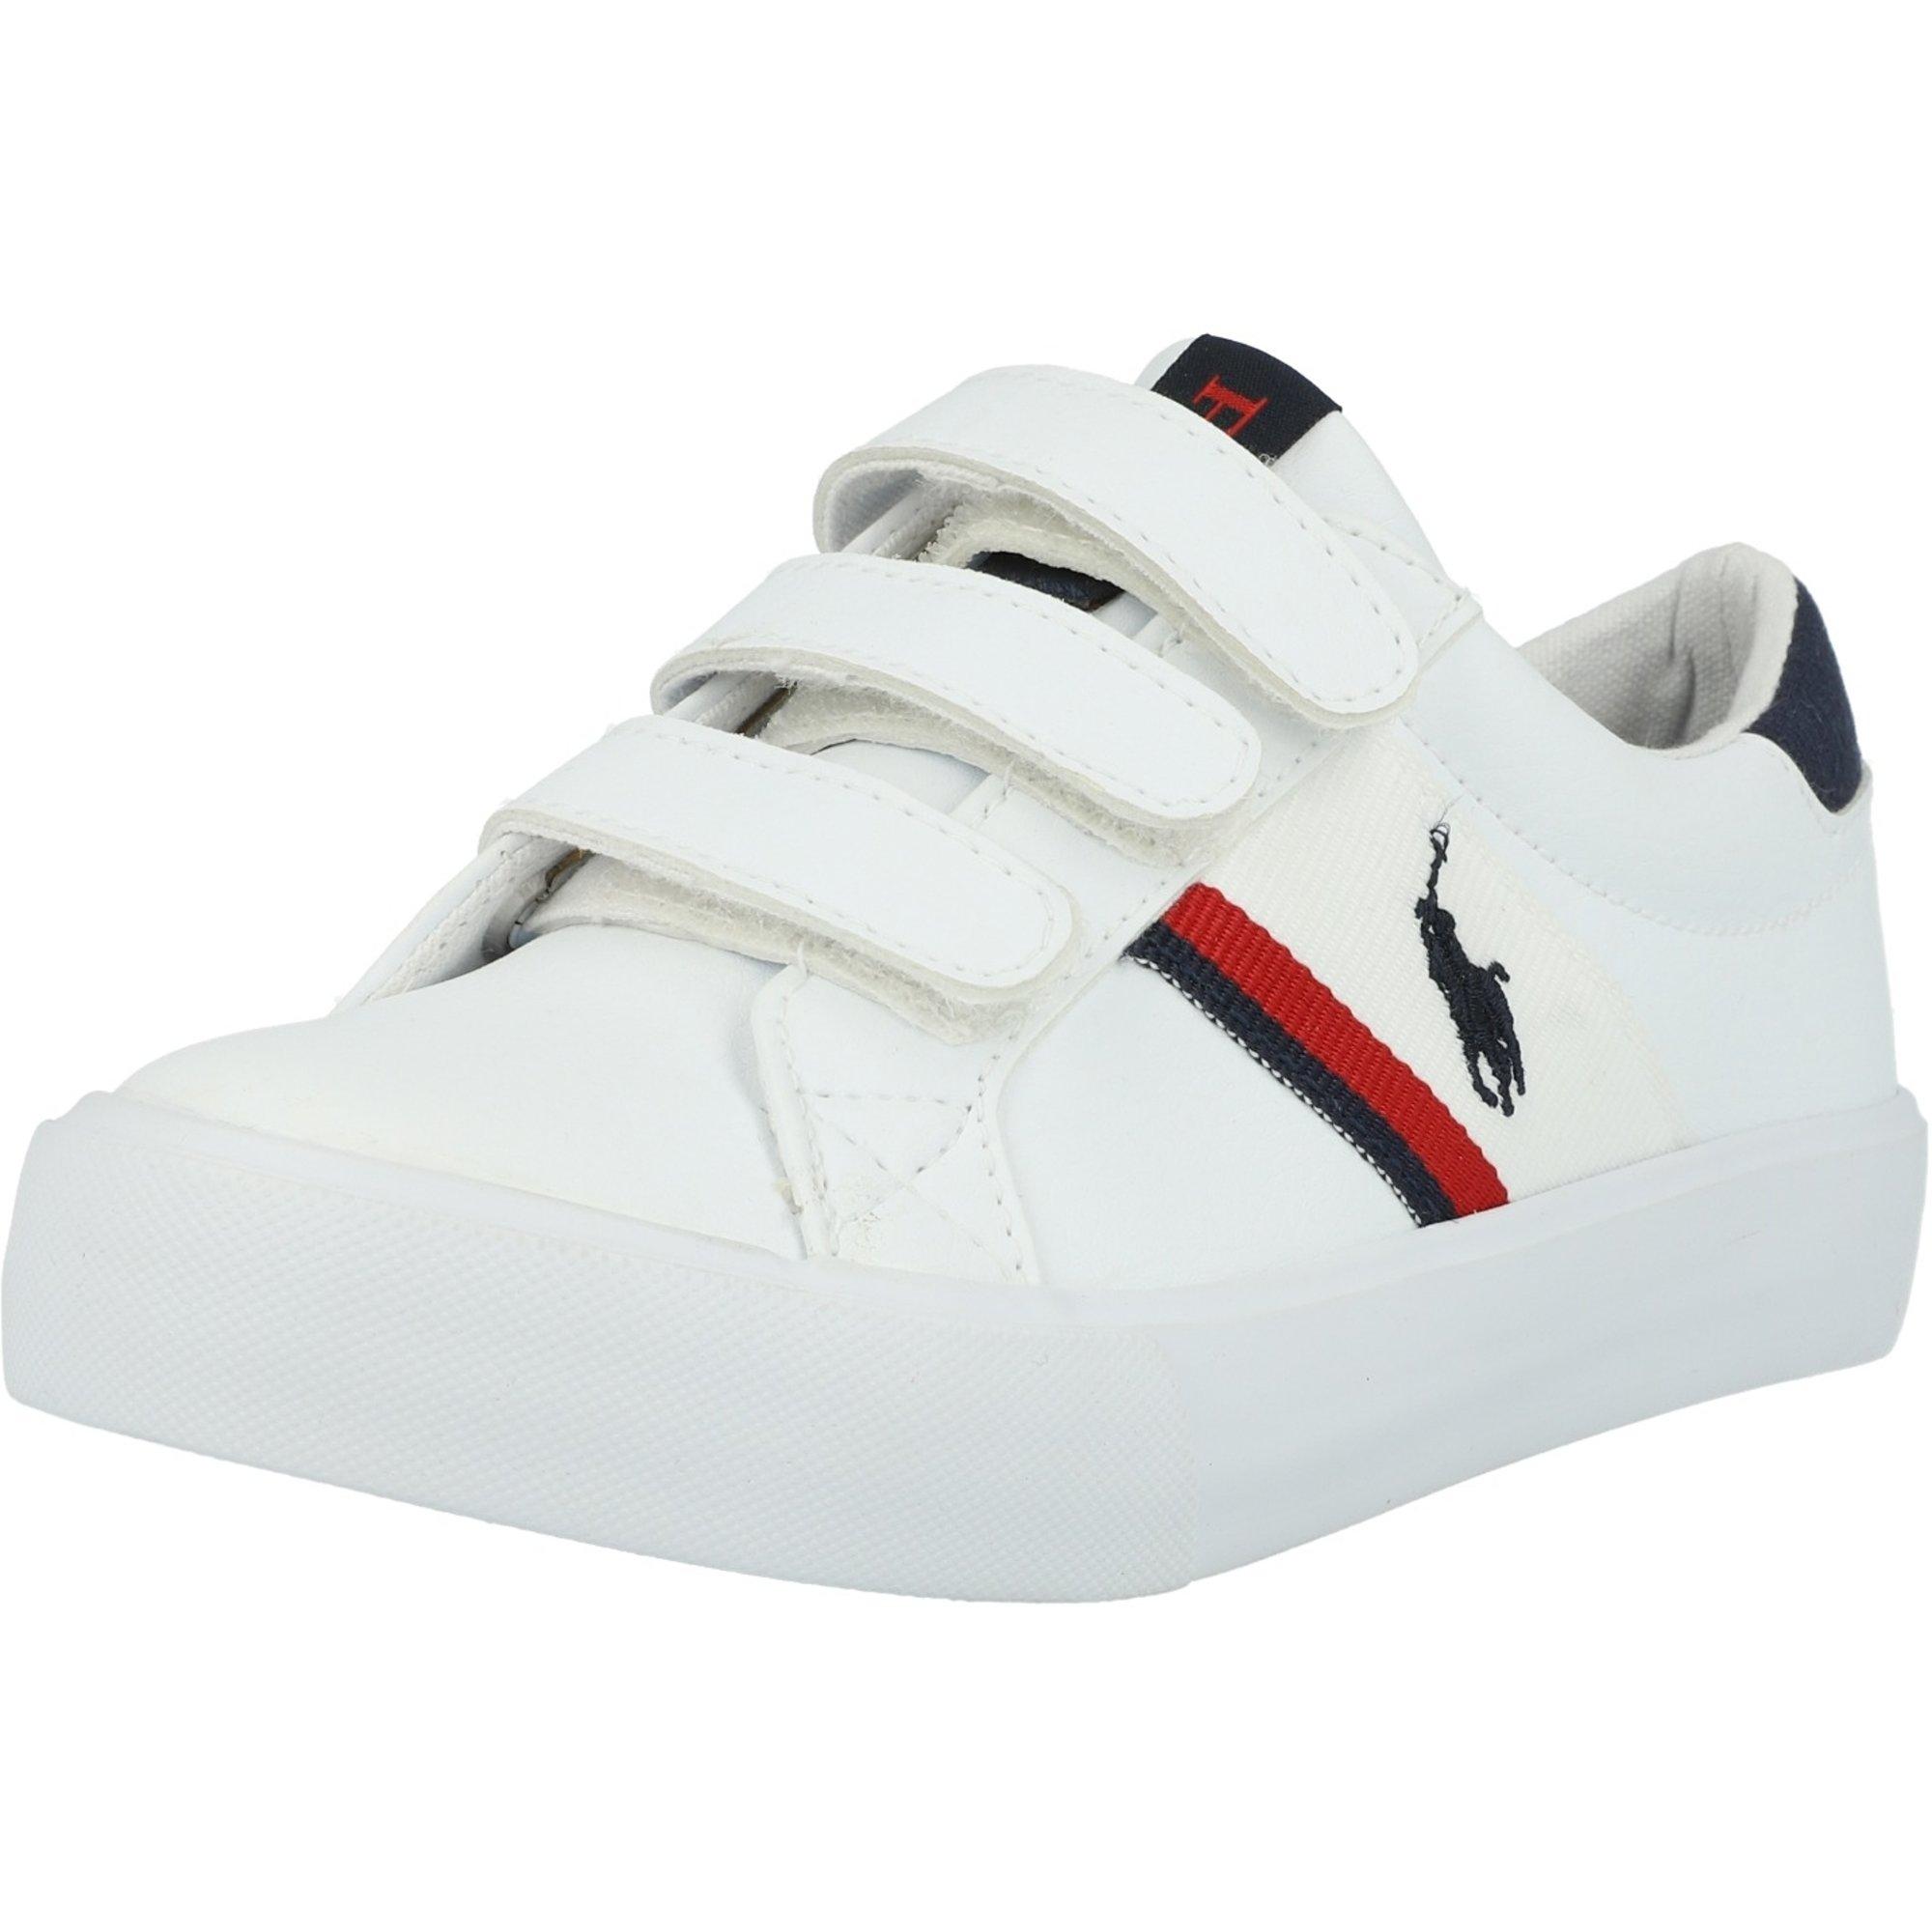 Polo Ralph Lauren Gaffney EZ C White/Navy Tumbled